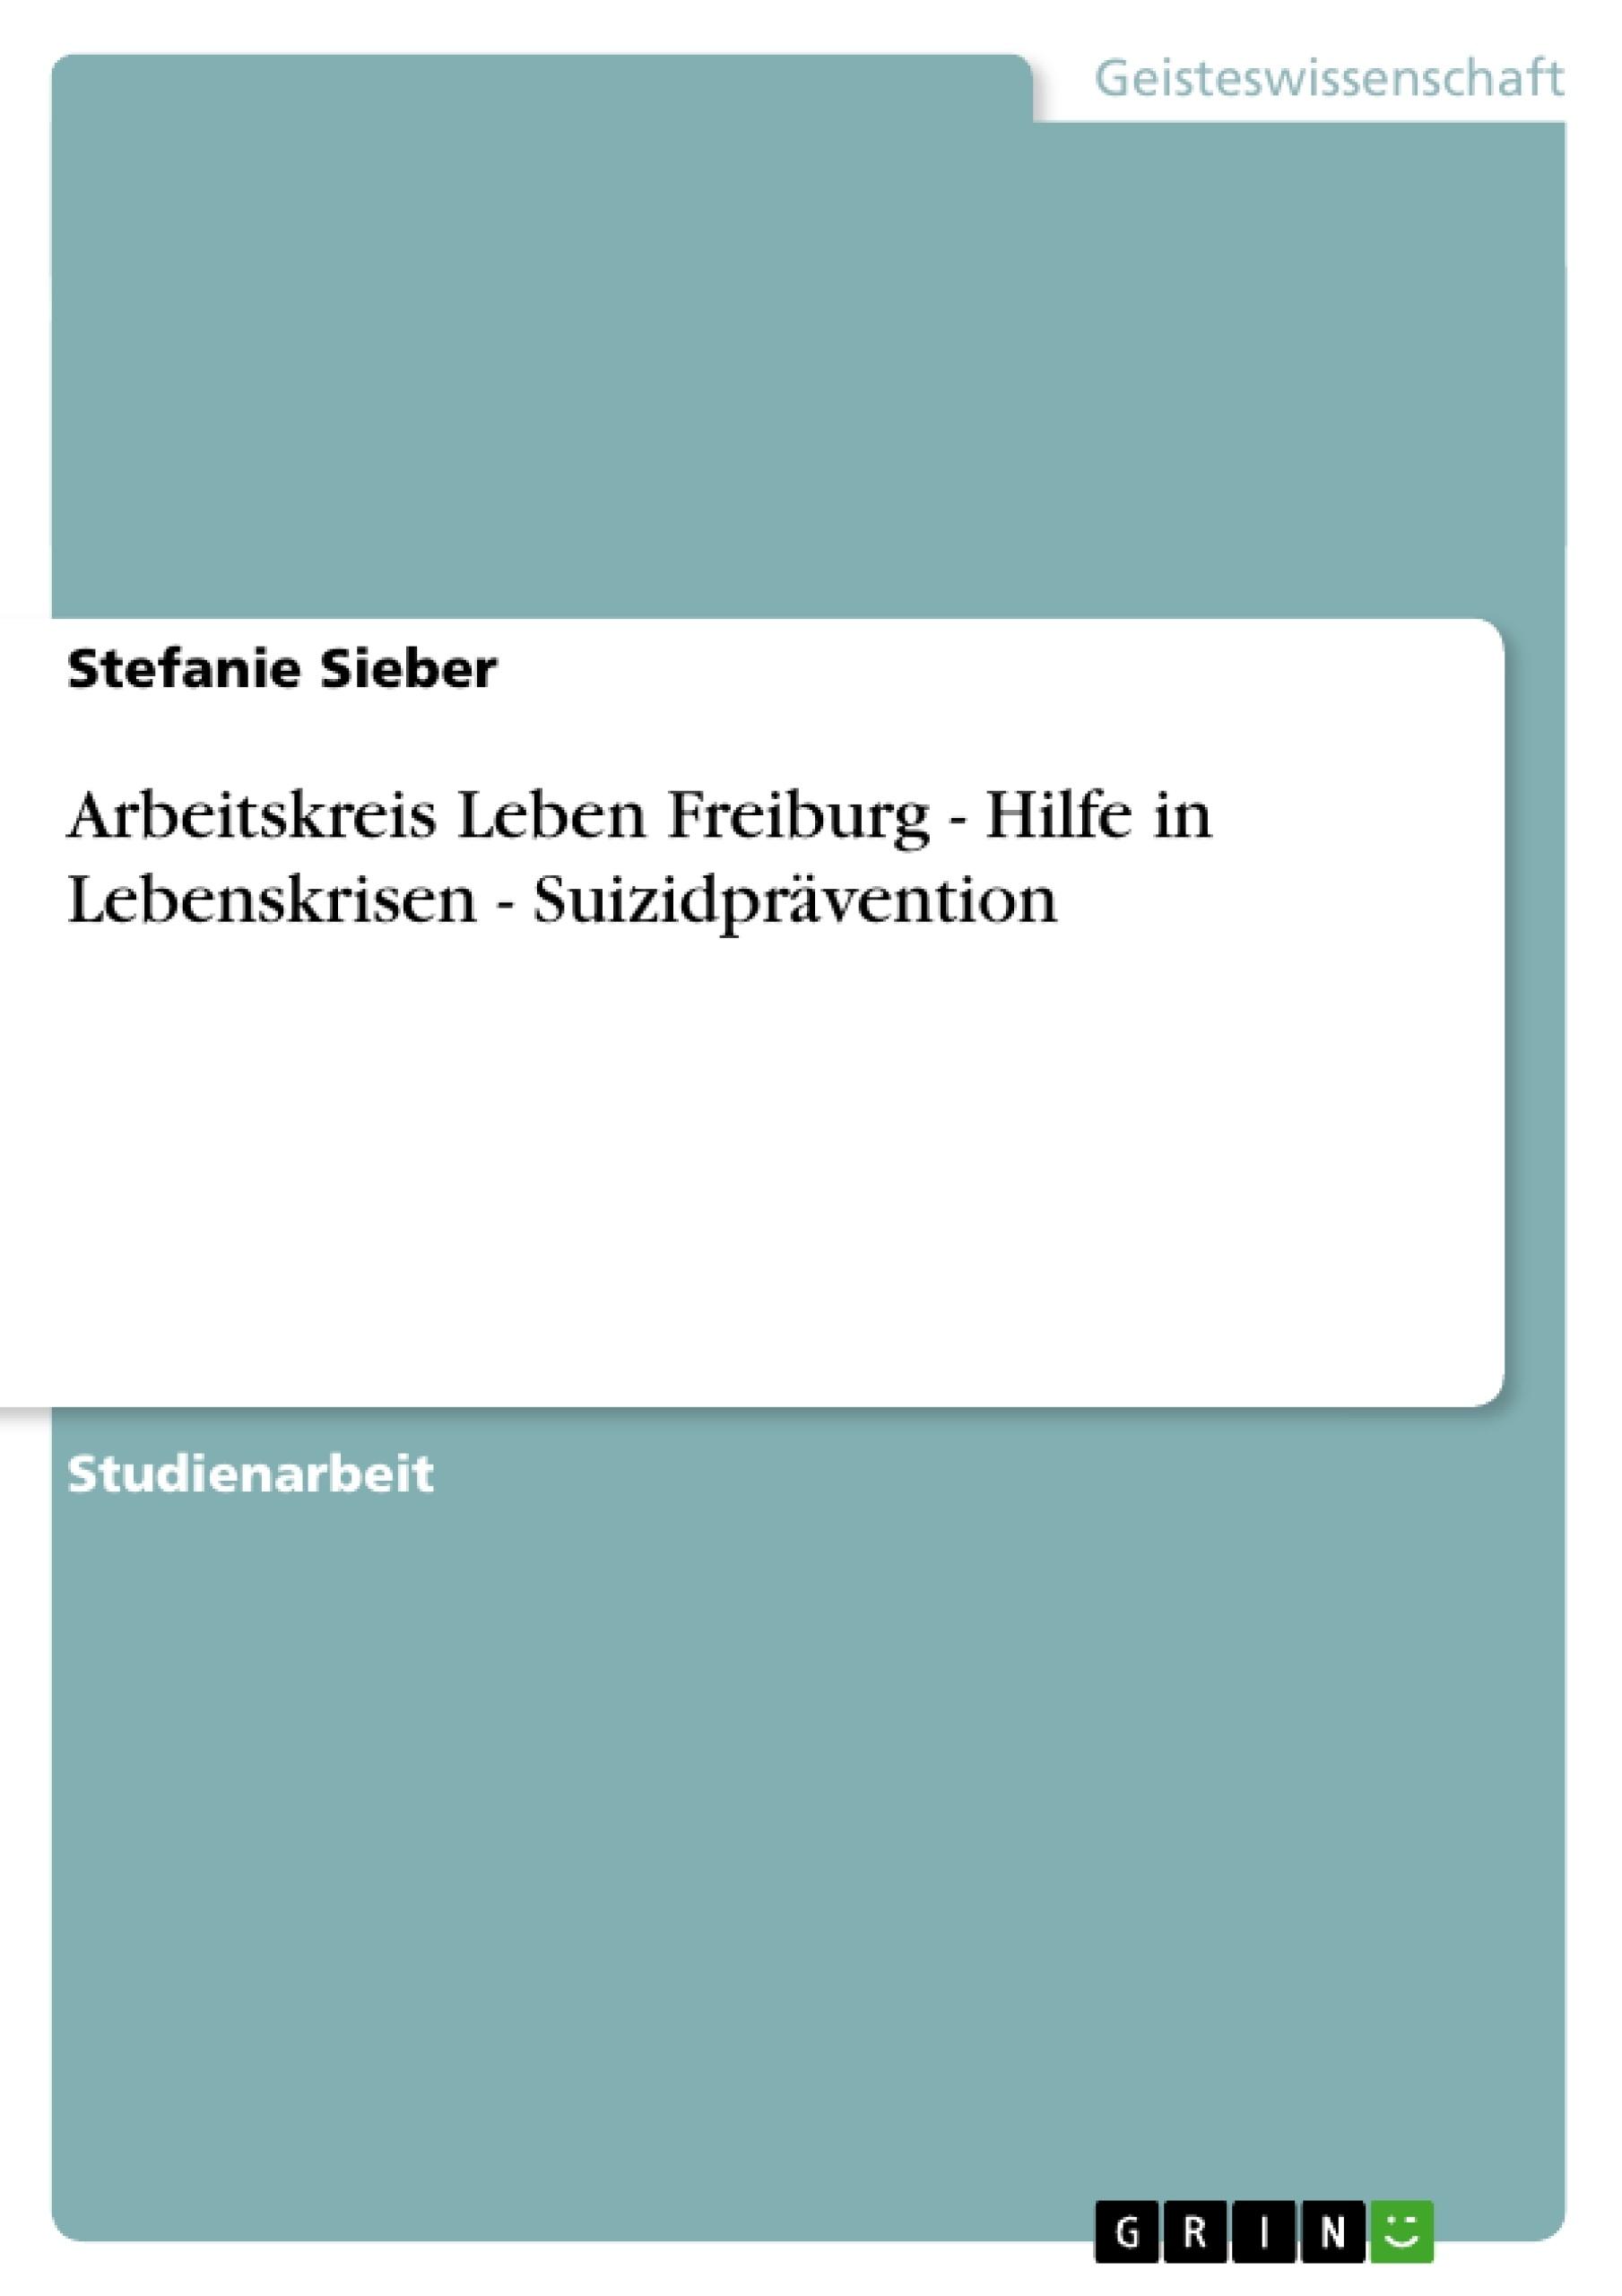 Titel: Arbeitskreis Leben Freiburg - Hilfe in Lebenskrisen - Suizidprävention